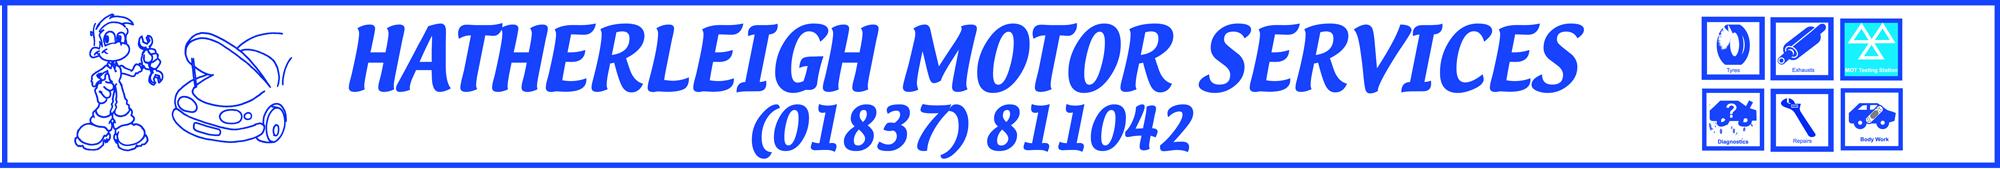 Hatherleigh Motor Services Logo